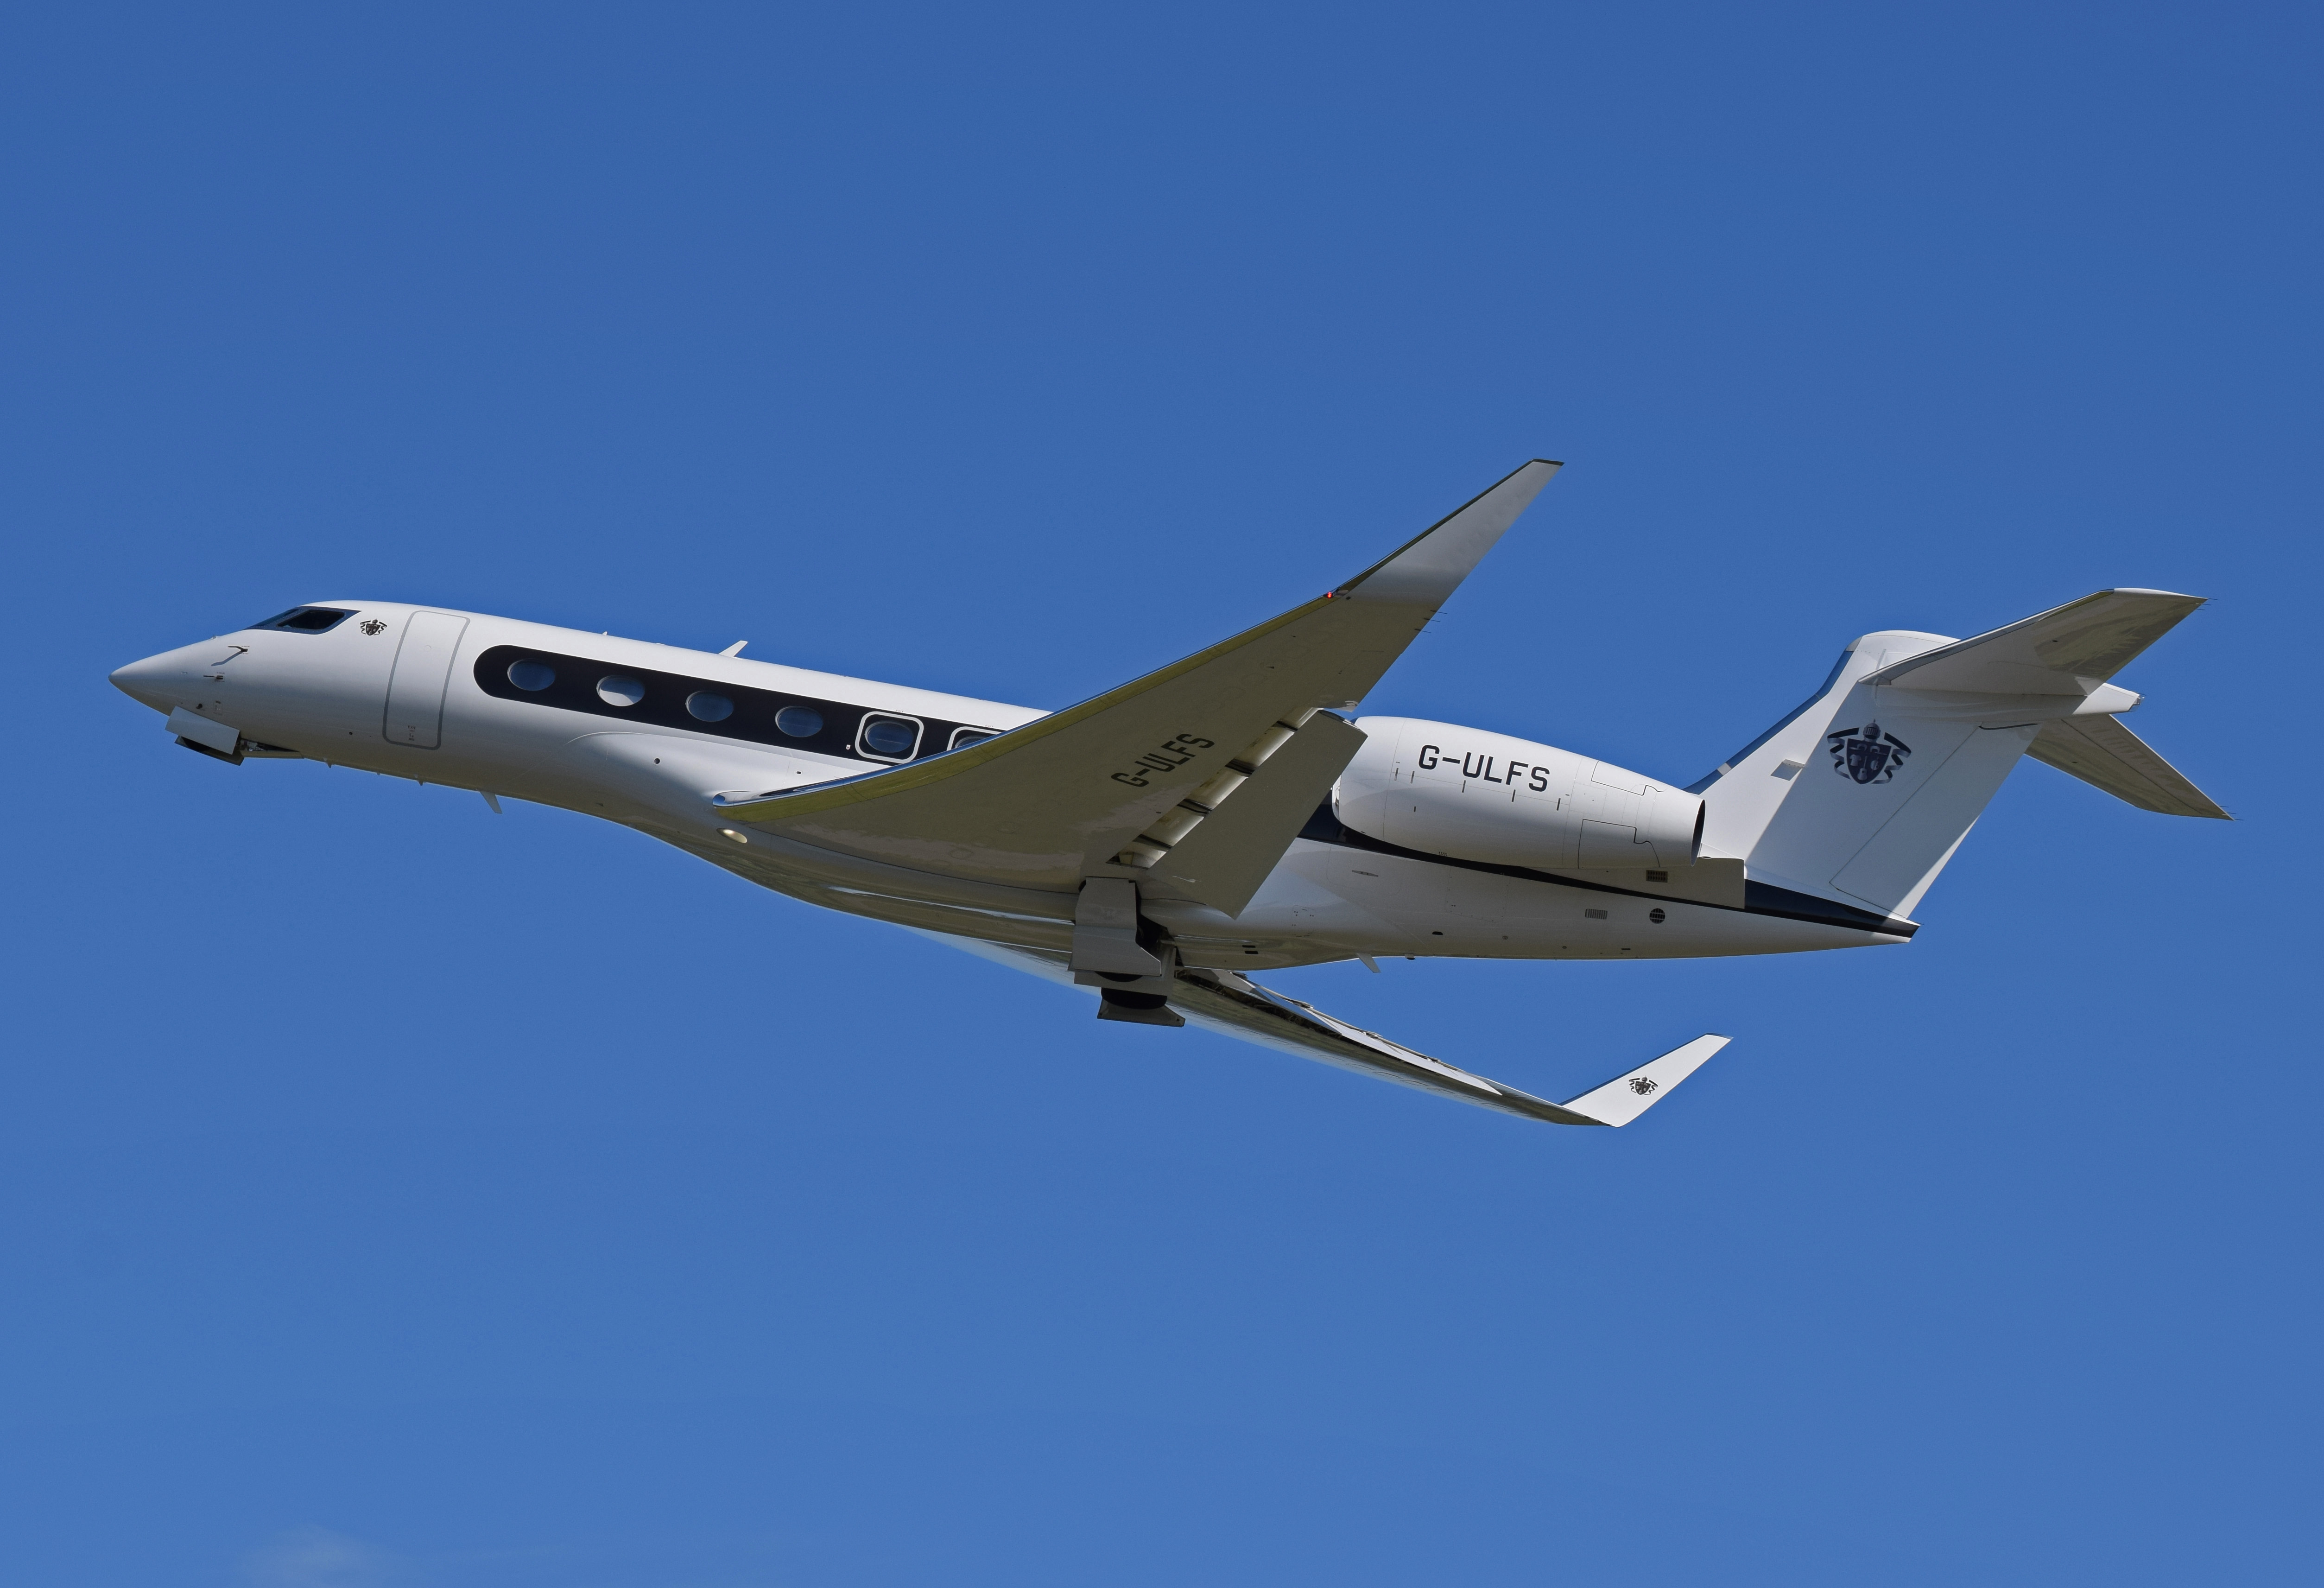 FileGulfstream G650 departs Bristol 23rdAug2014 arpjpg